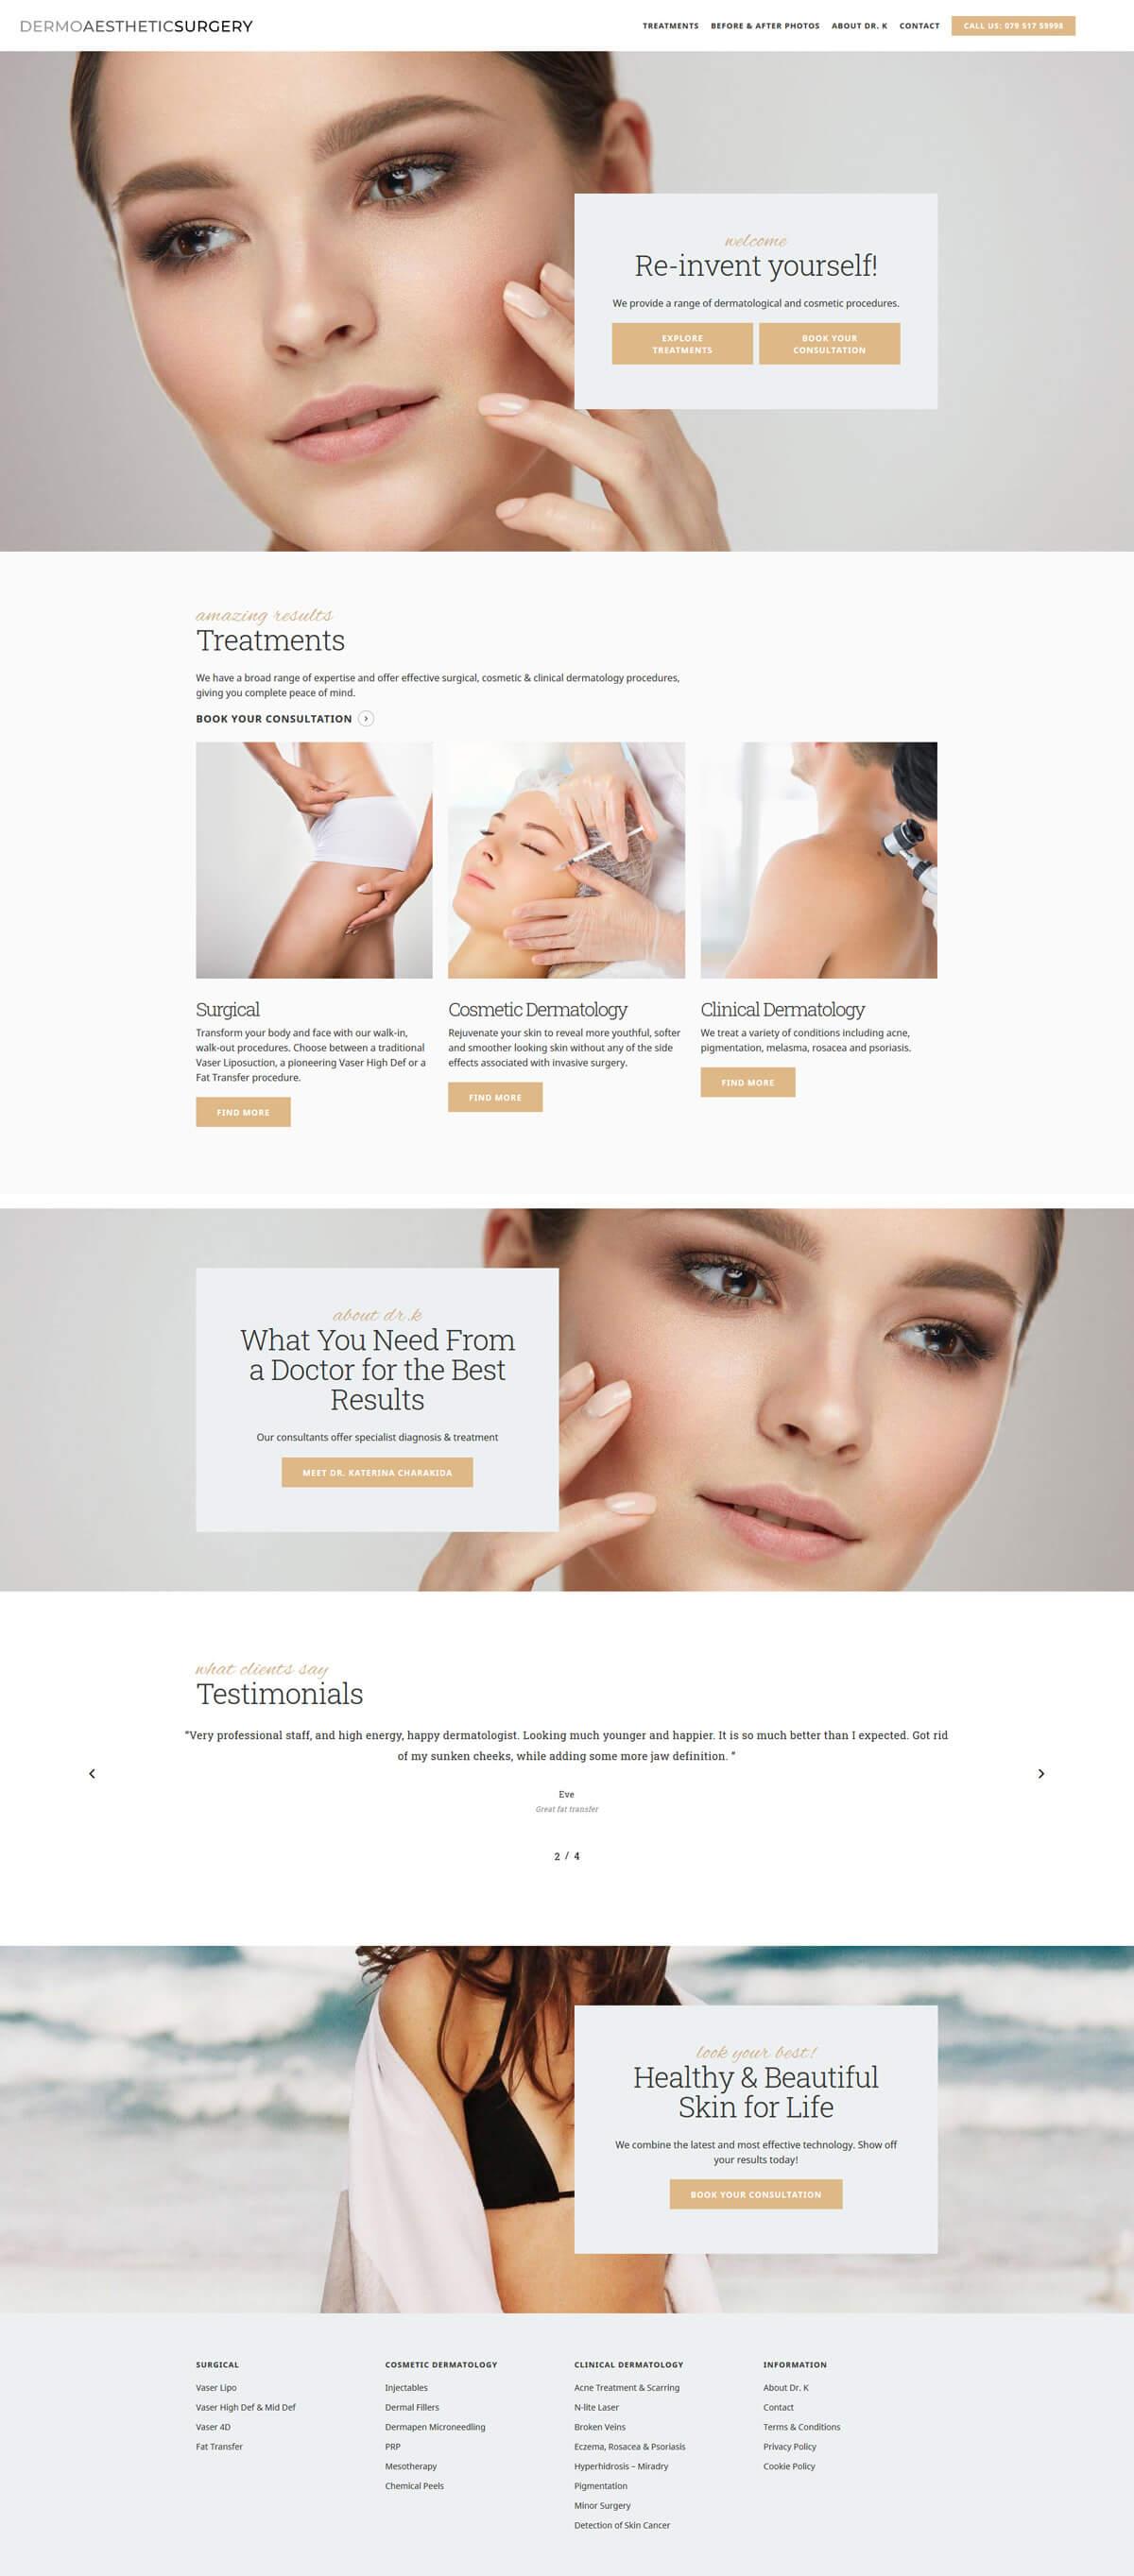 Dermo Aesthetic Surgery - dermoaestheticsurgery.com - Case Study 1 - developed by Digital Artifacts Creative